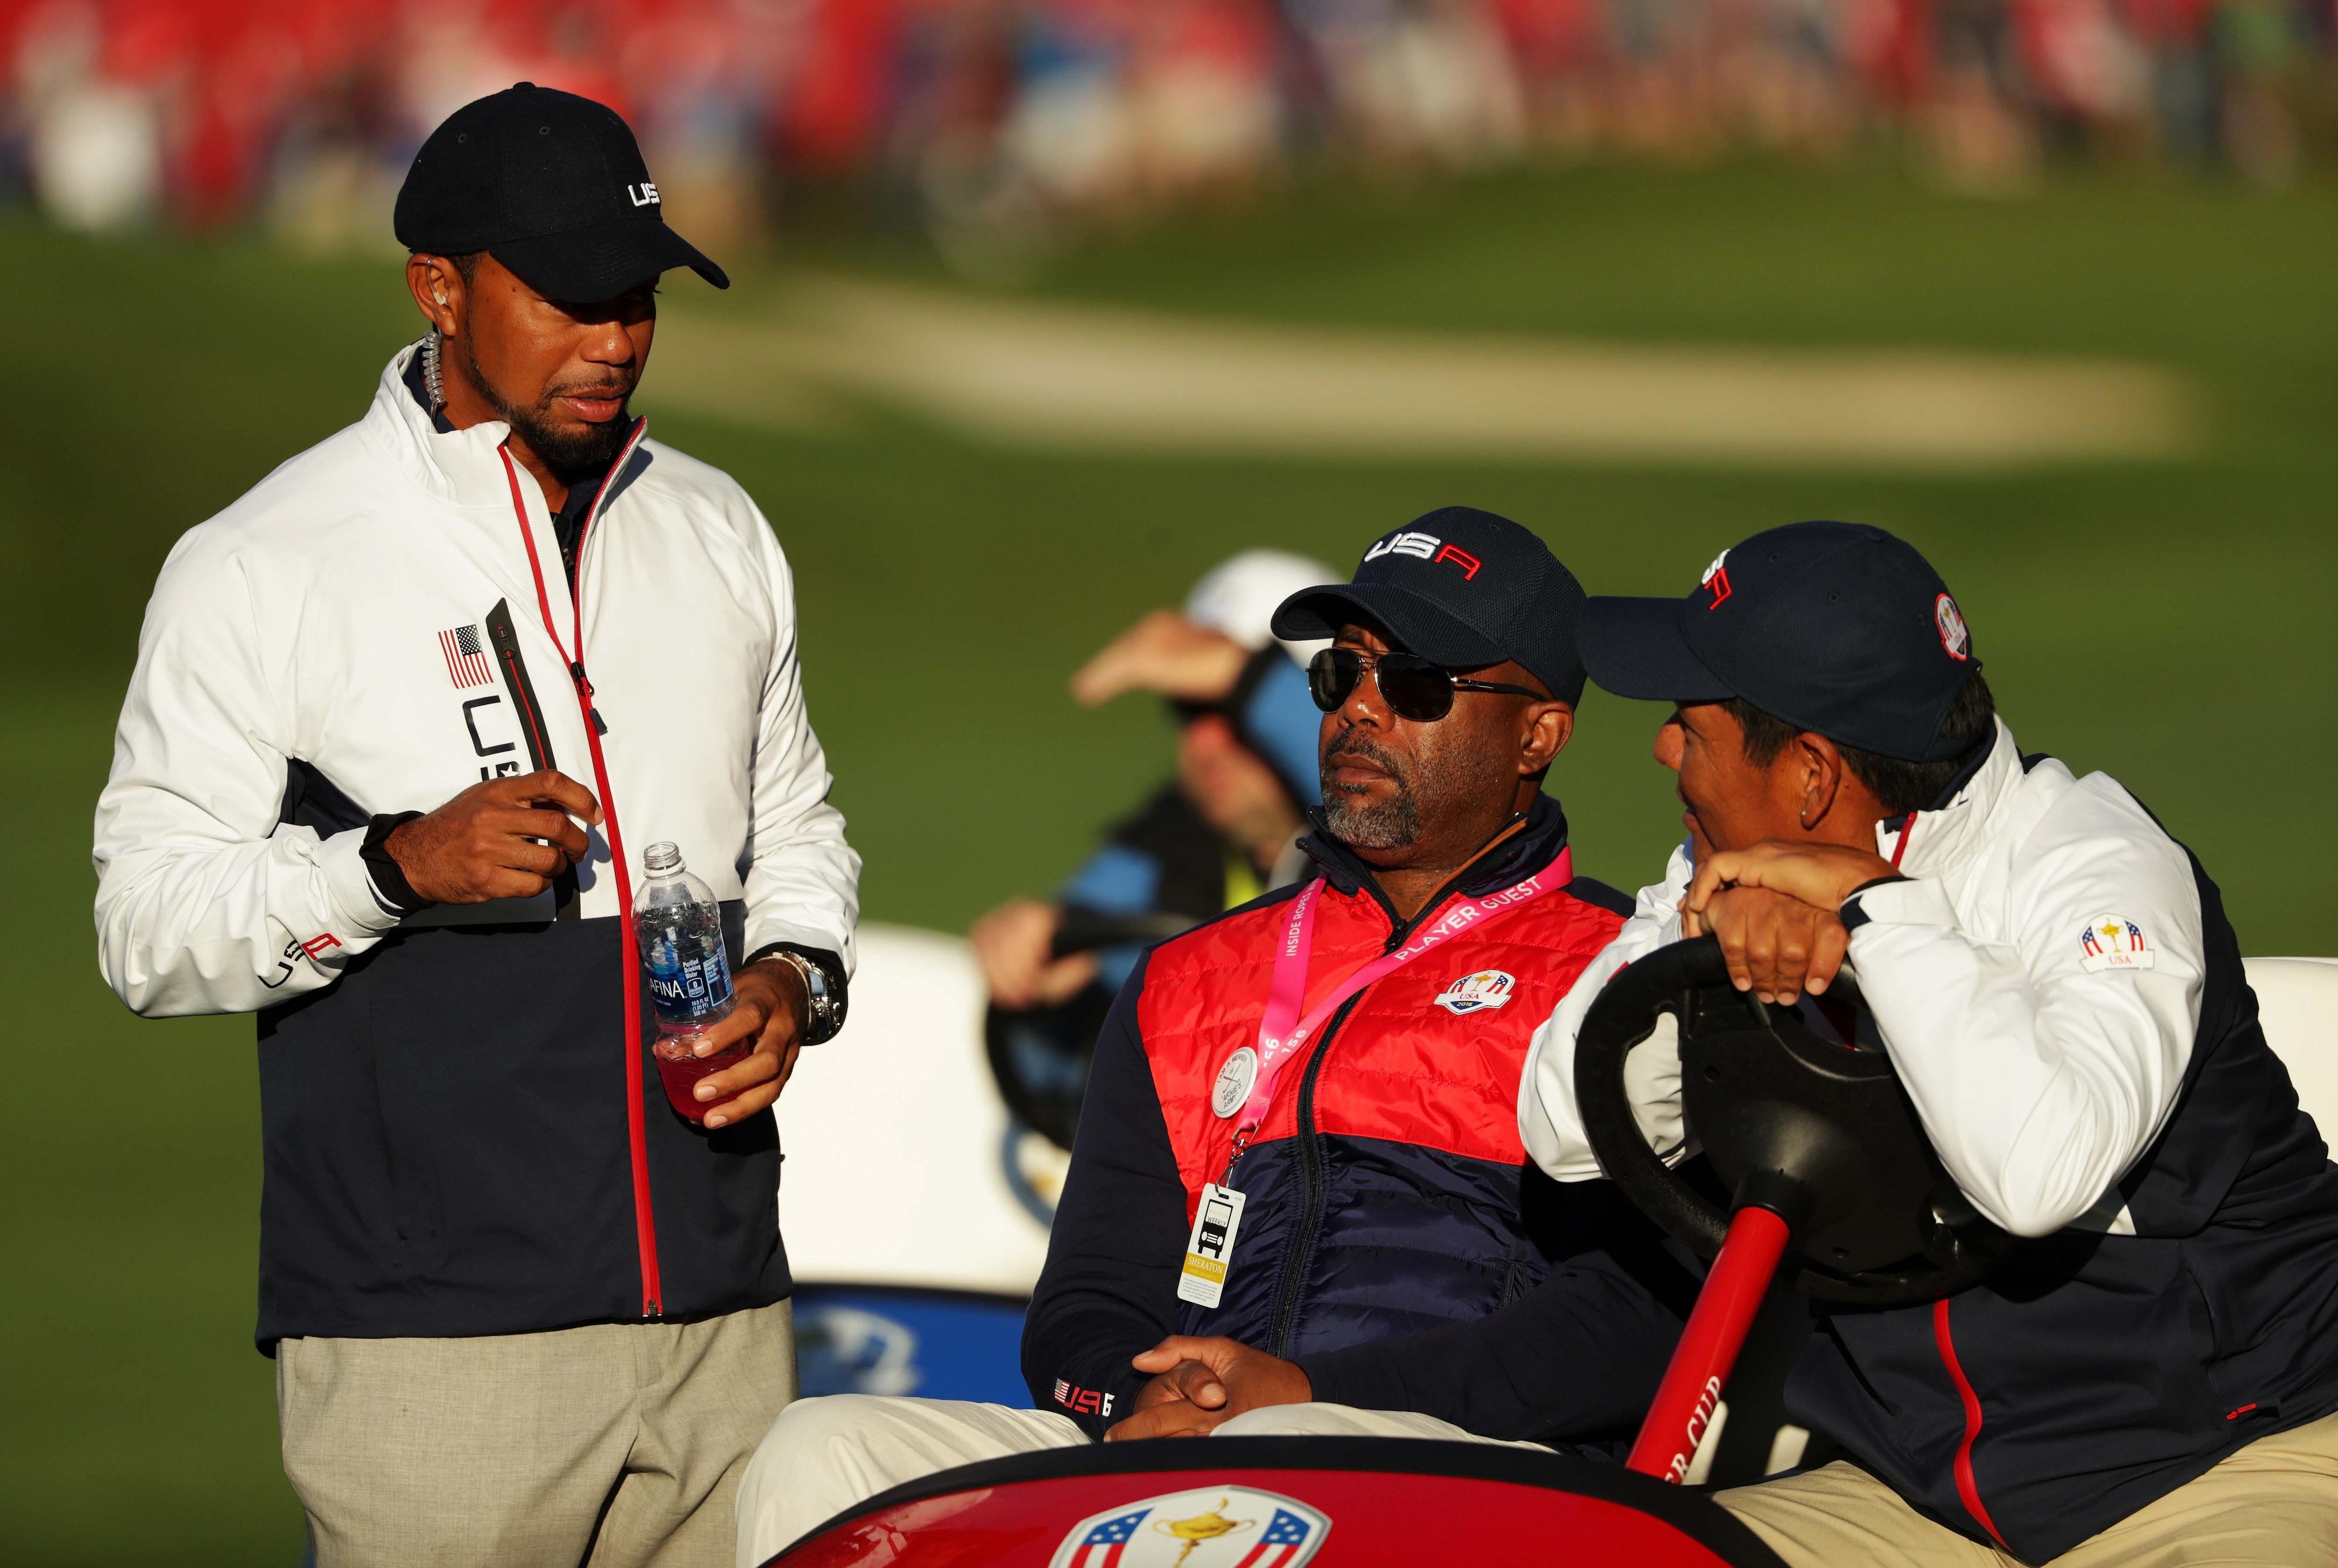 Tiger Woods, Darius Rucker and Notah Begay III